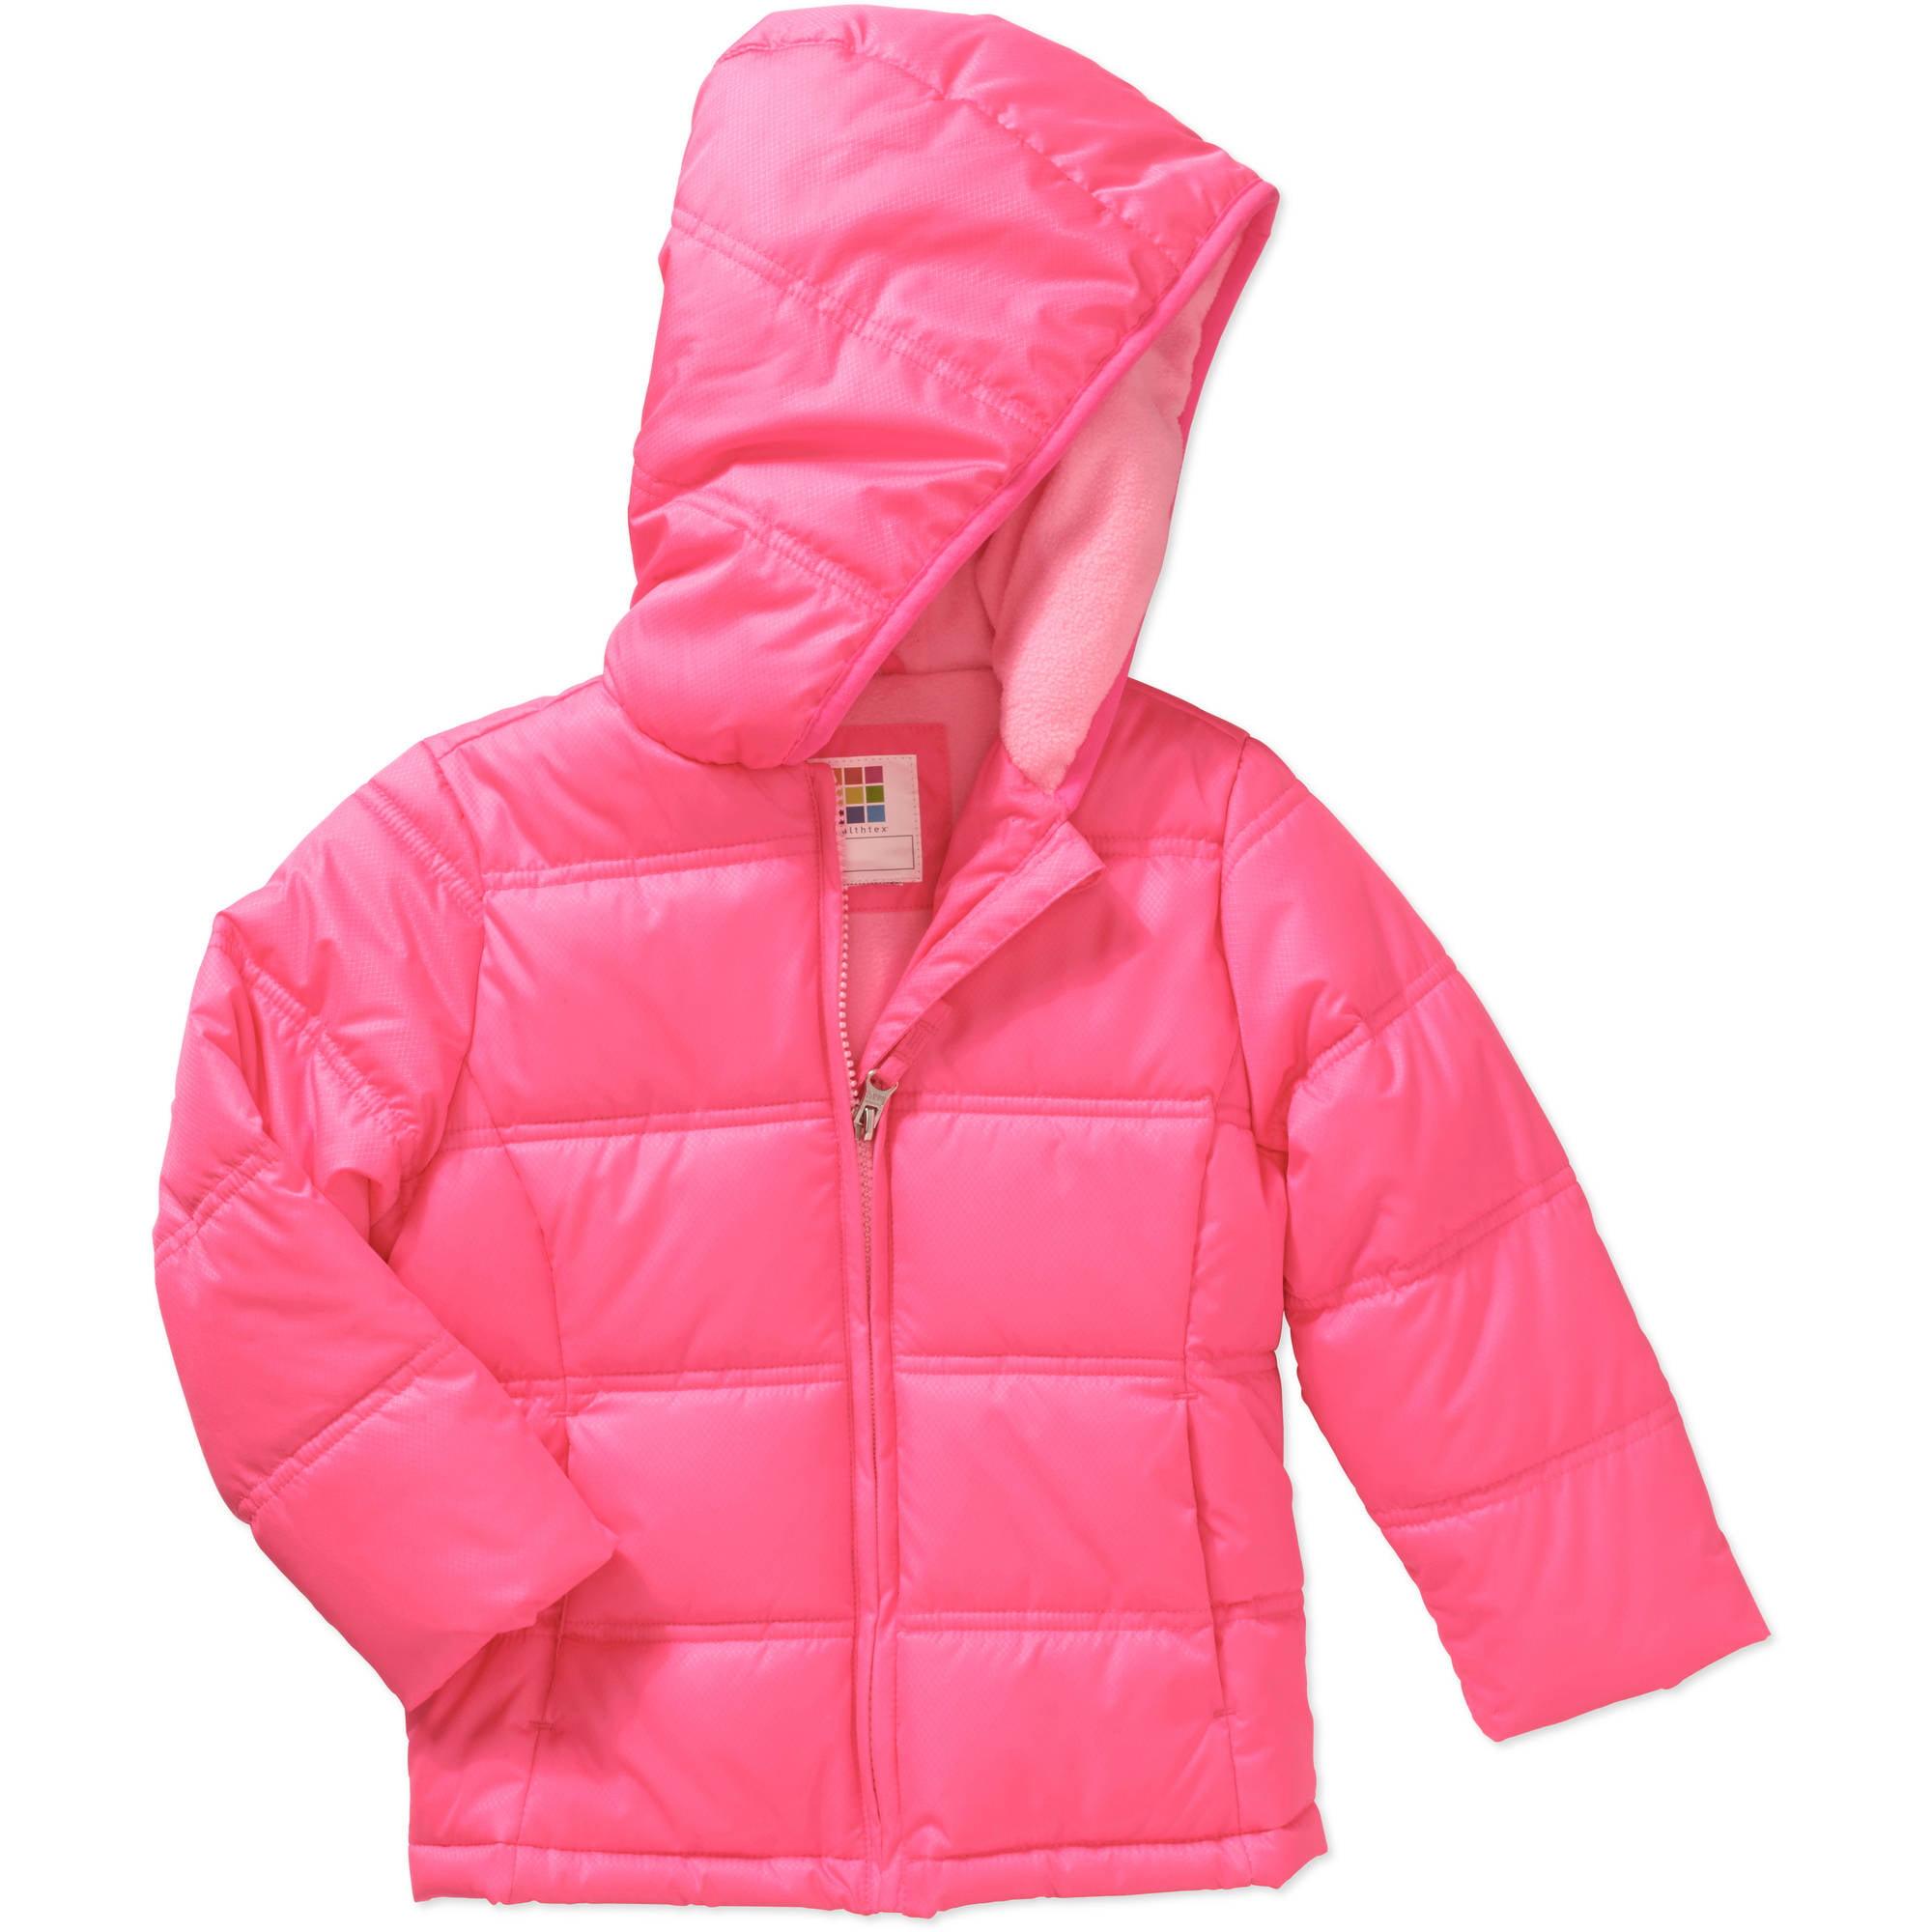 Healthtex Baby Toddler Girls' Bubble Puffer Jacket